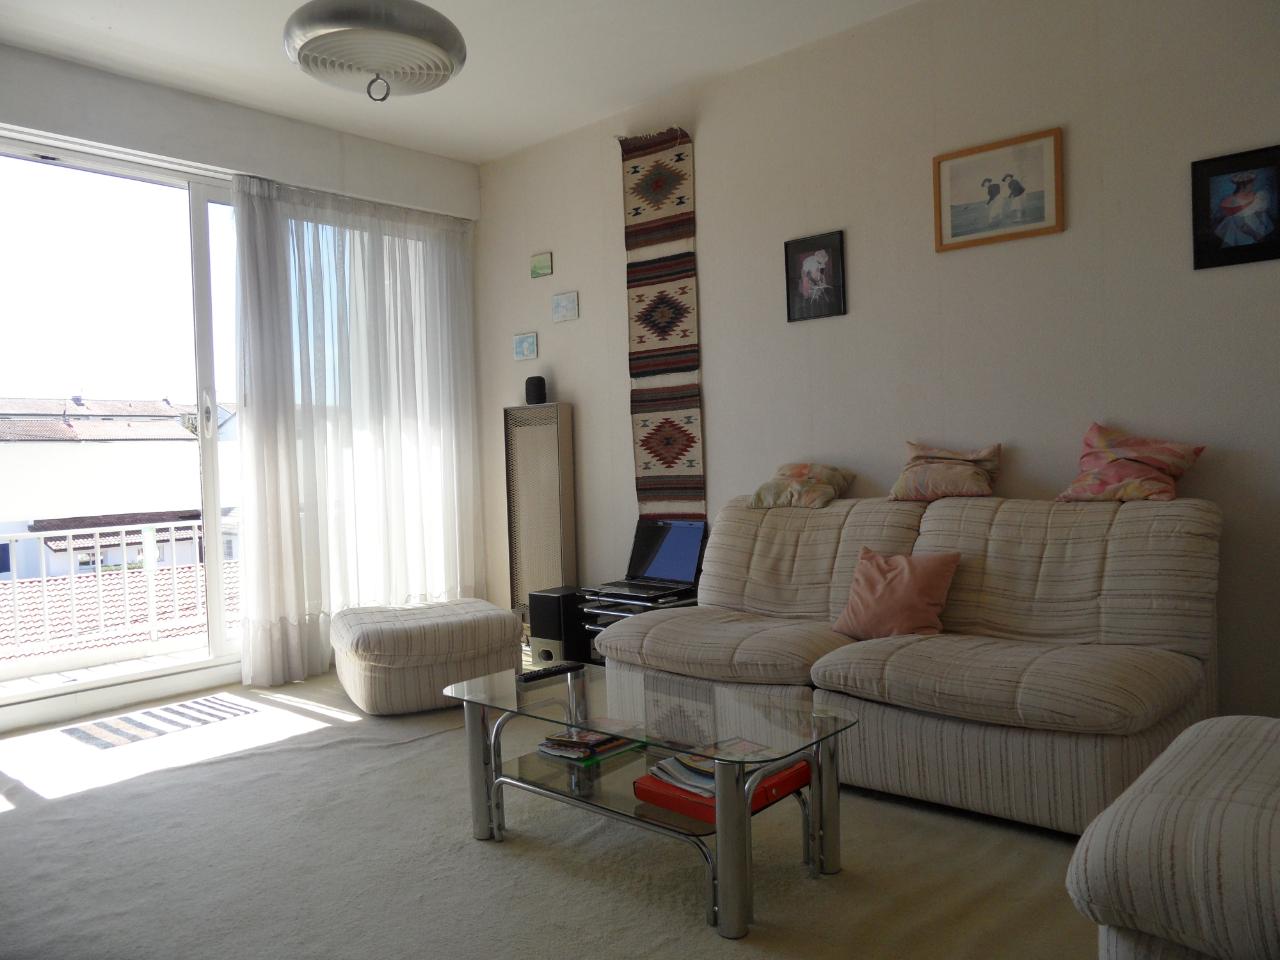 vente appartement à CIBOURE - 218 000